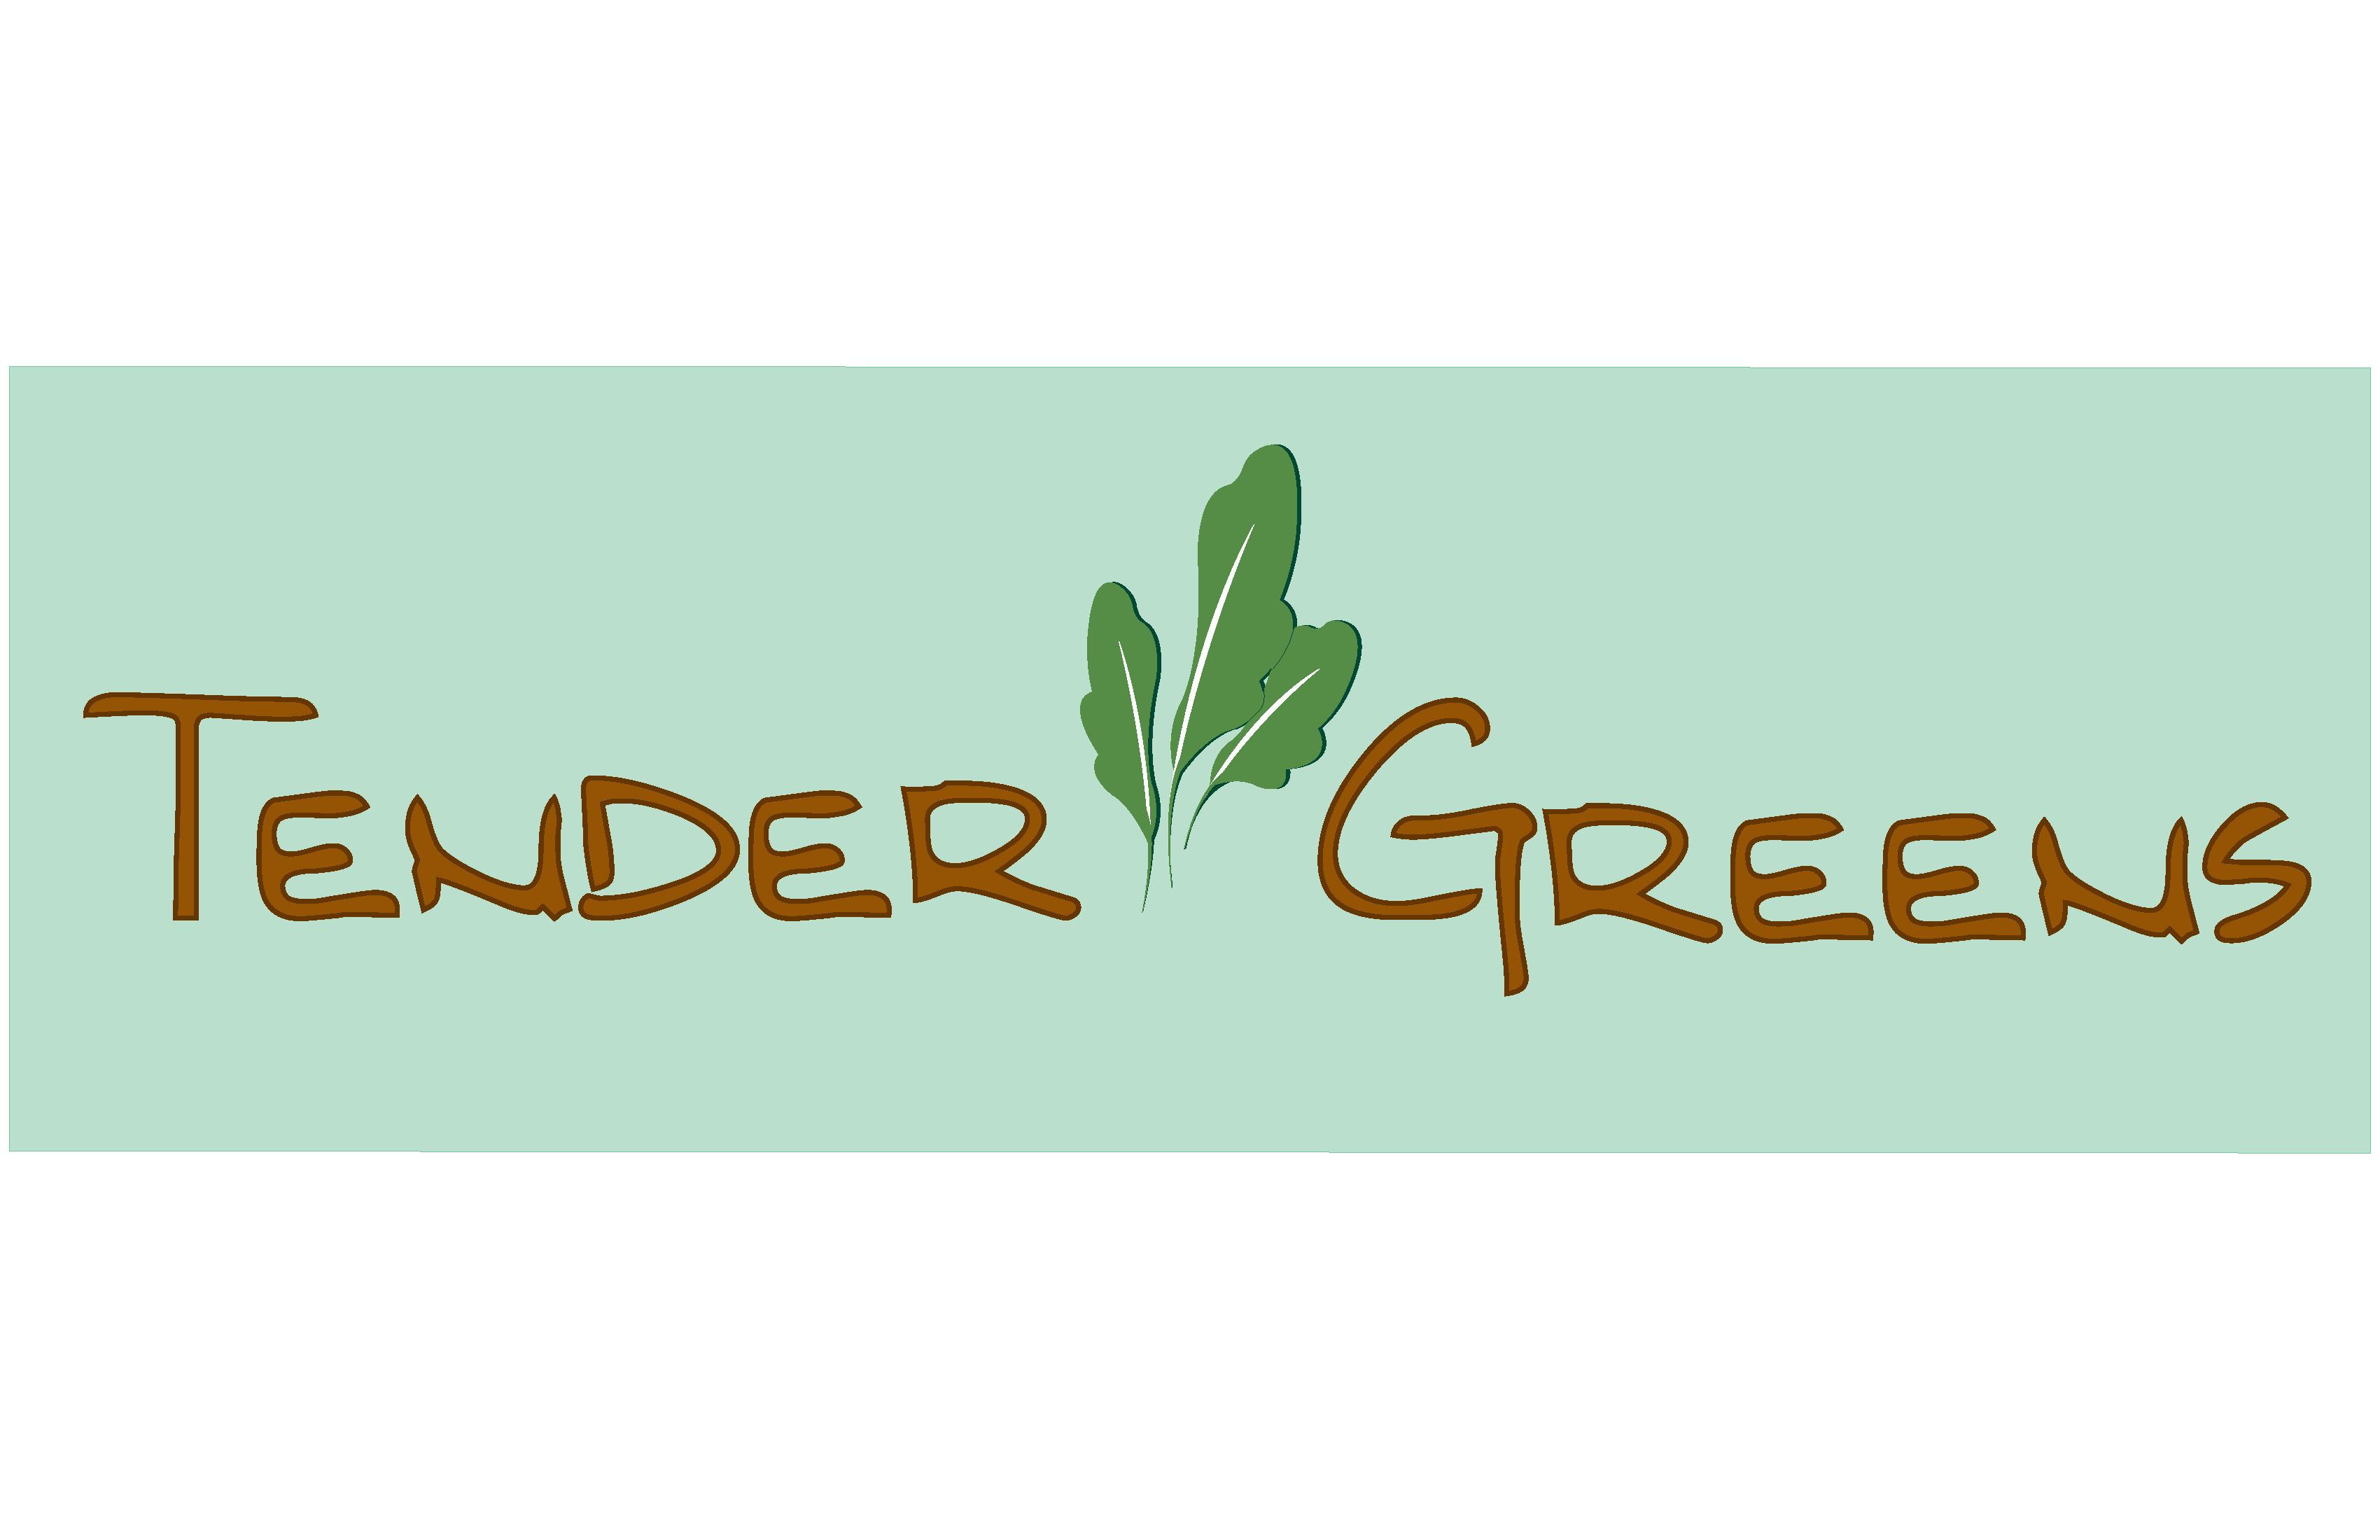 tender_greens_logo__Converted__copy.jpg